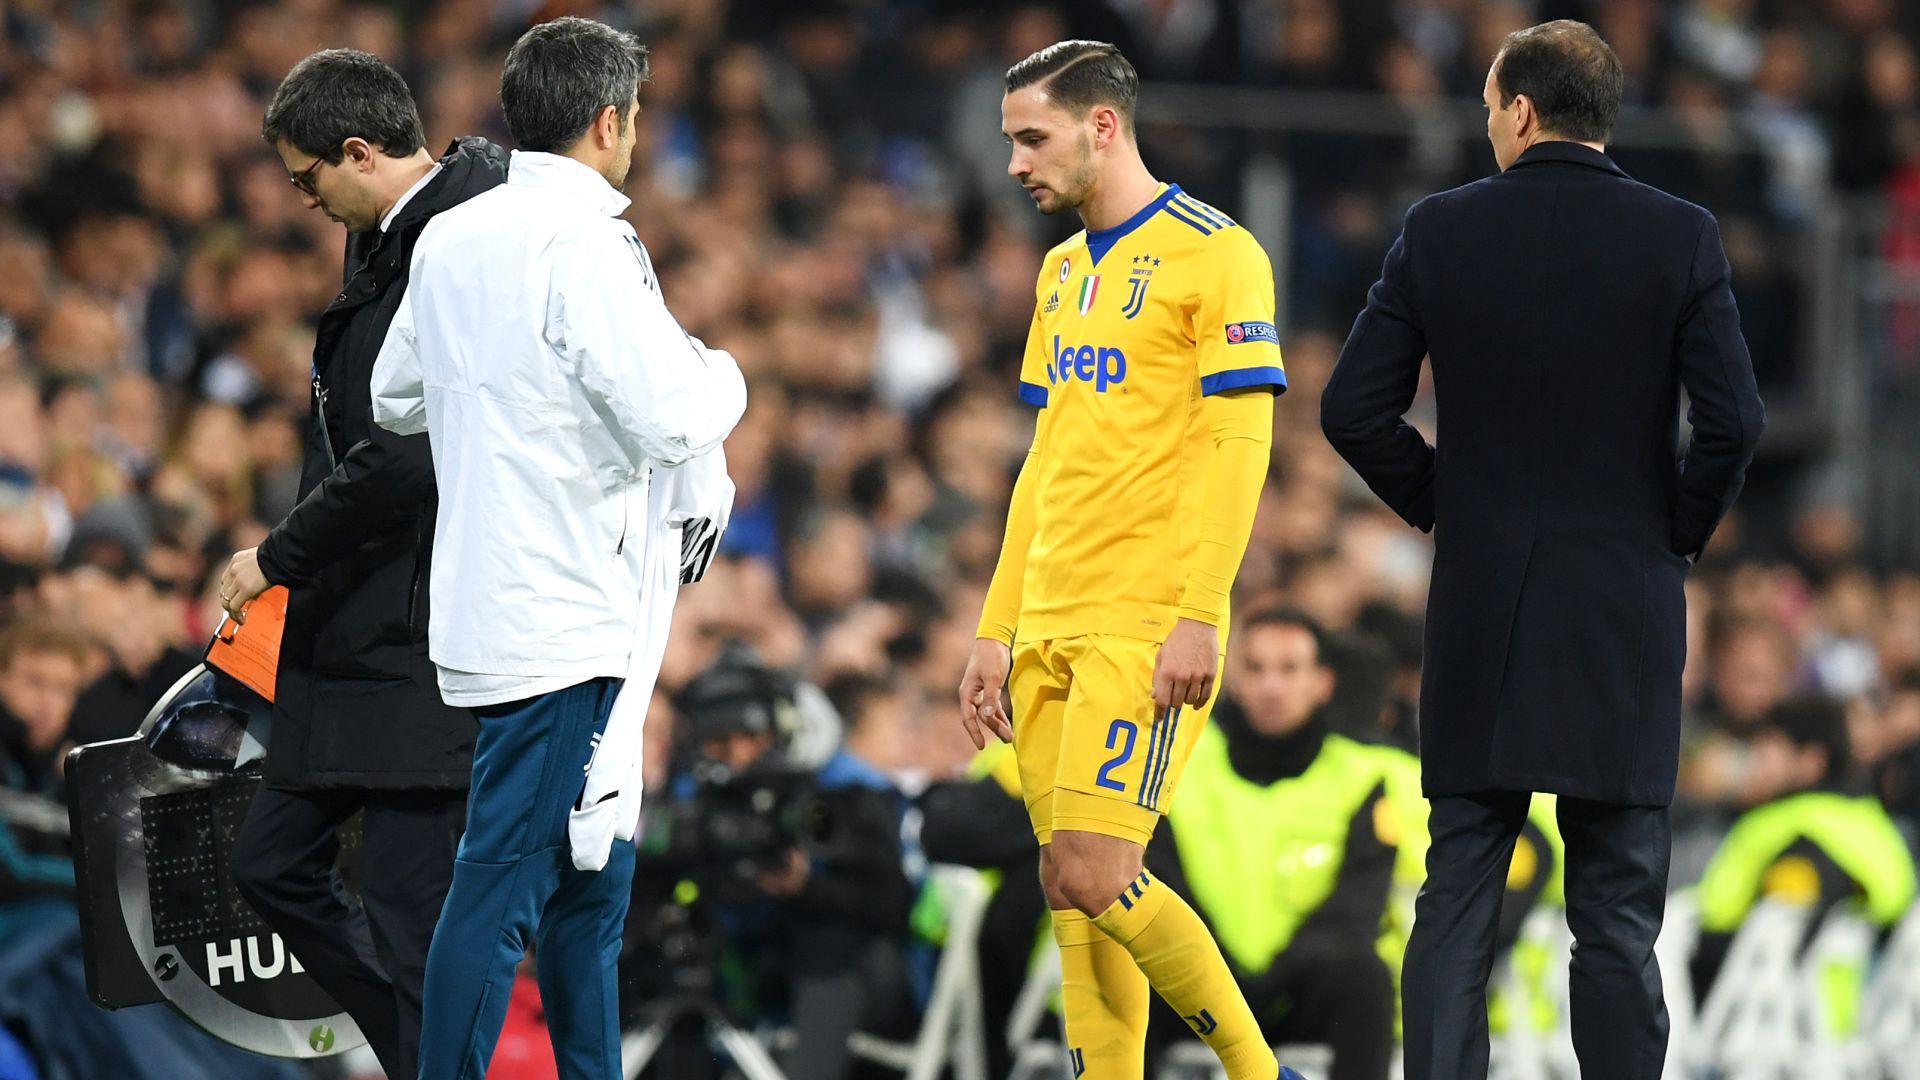 Juventus, infortunio per De Sciglio: sospetta lesione al piede sinistro